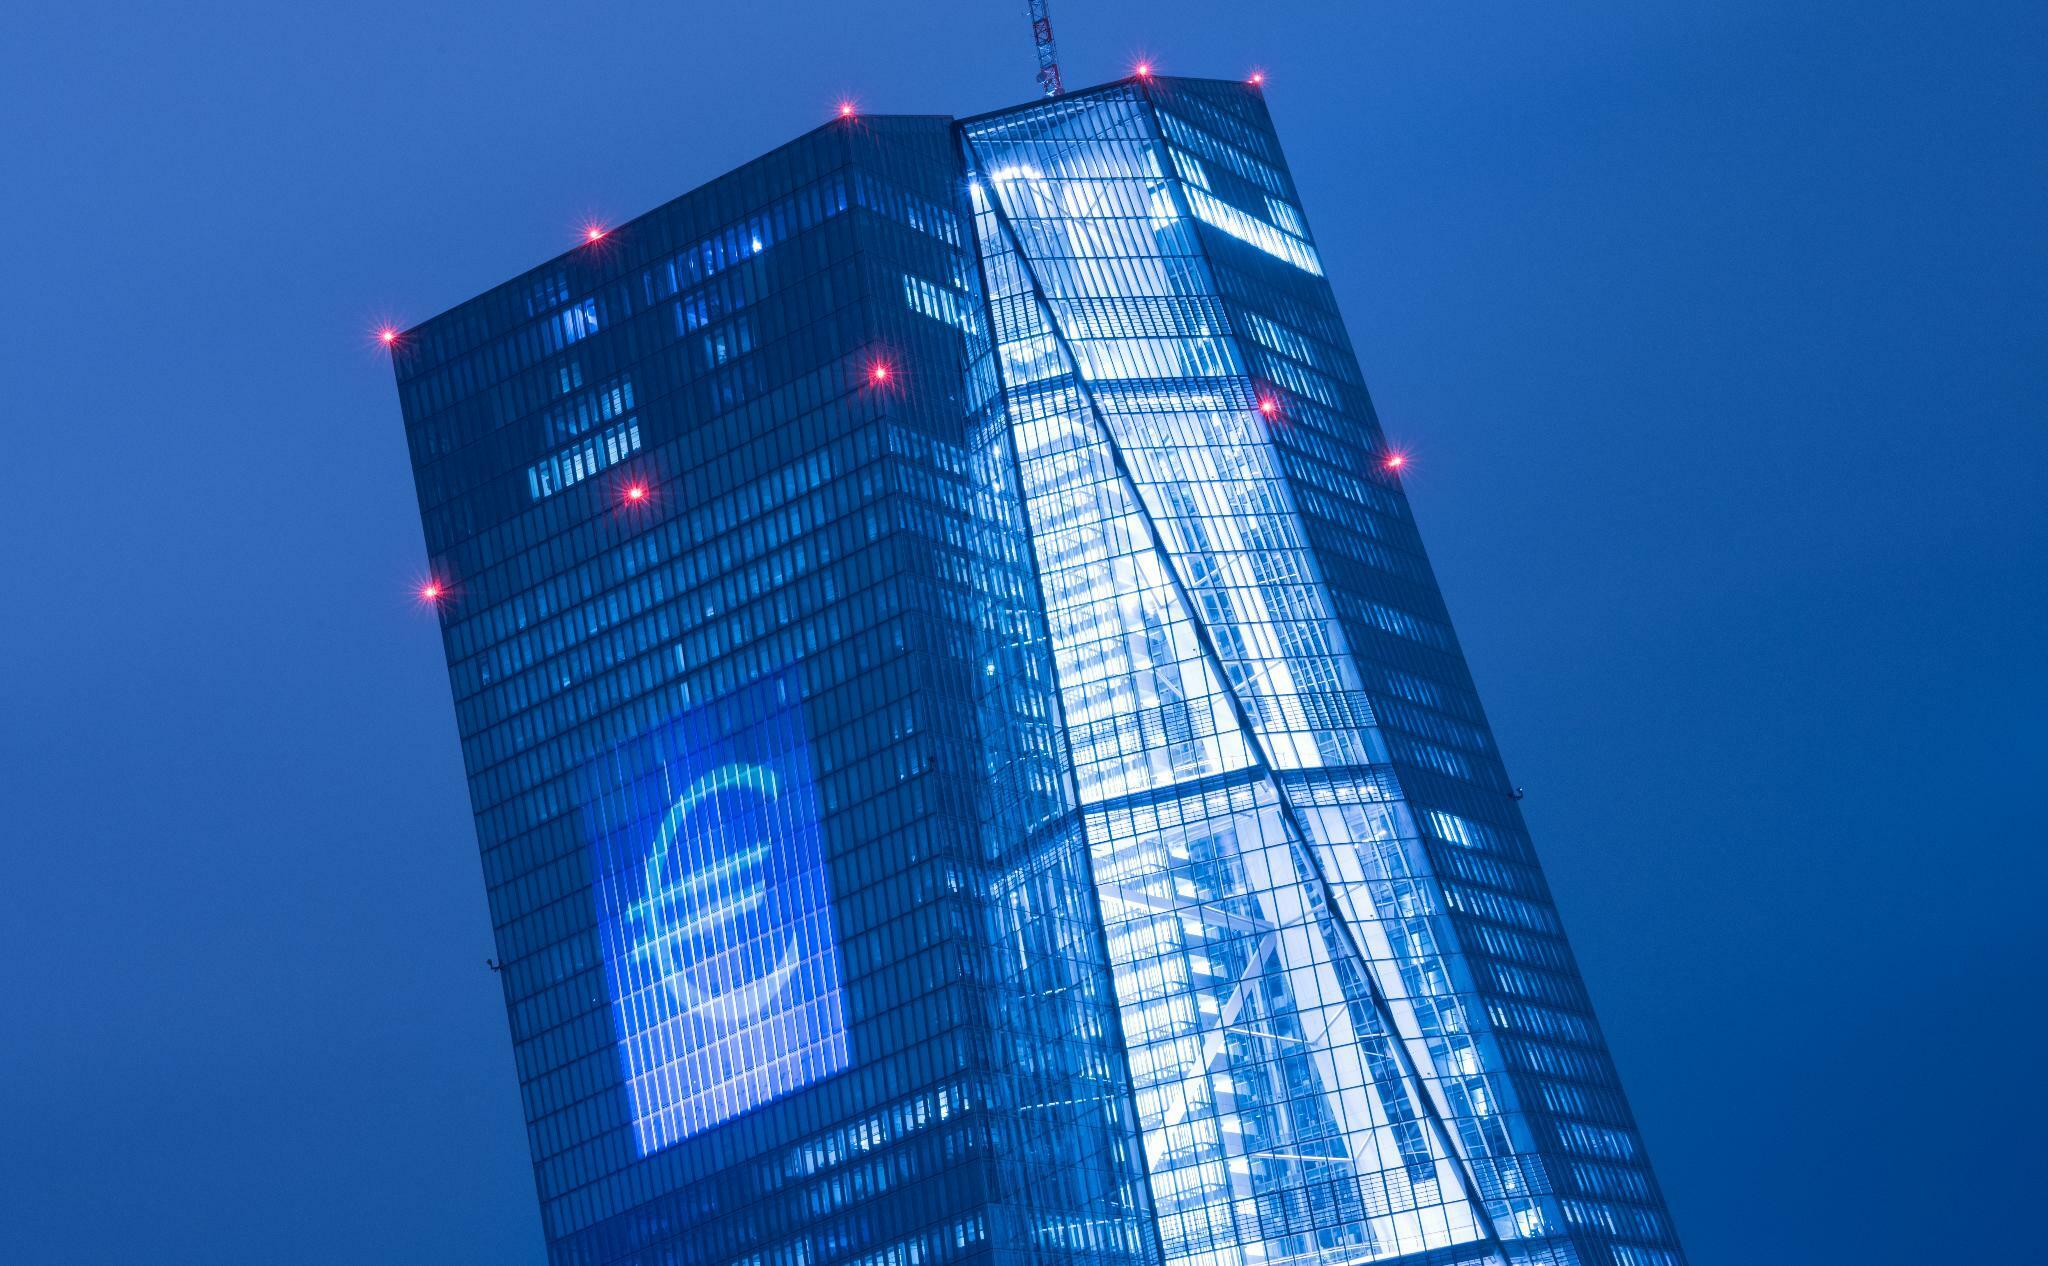 EZB: Geldpolitik dürfte spätestens 2021 an Obergrenze stoßen